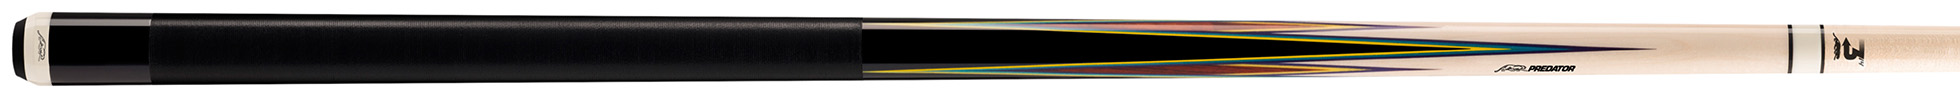 PK4057: Predator Roadline Sneaky Pete SP8LWM #1